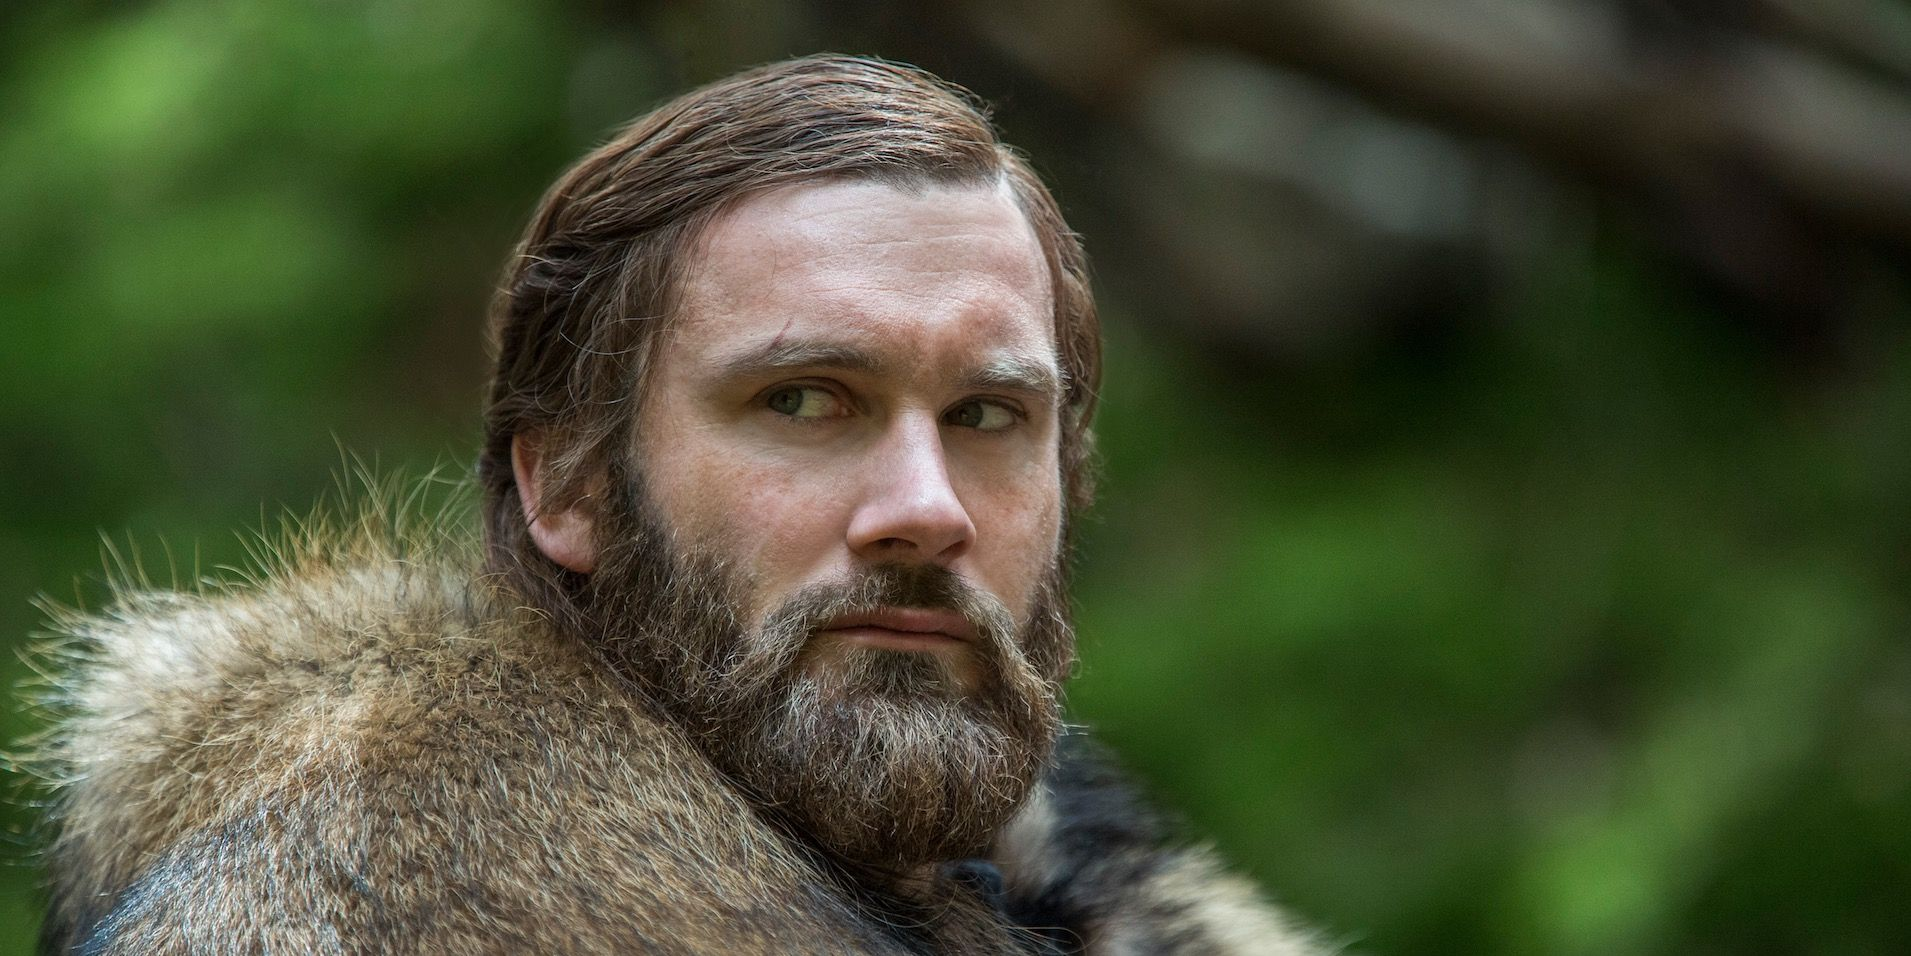 Rollo in History's Vikings